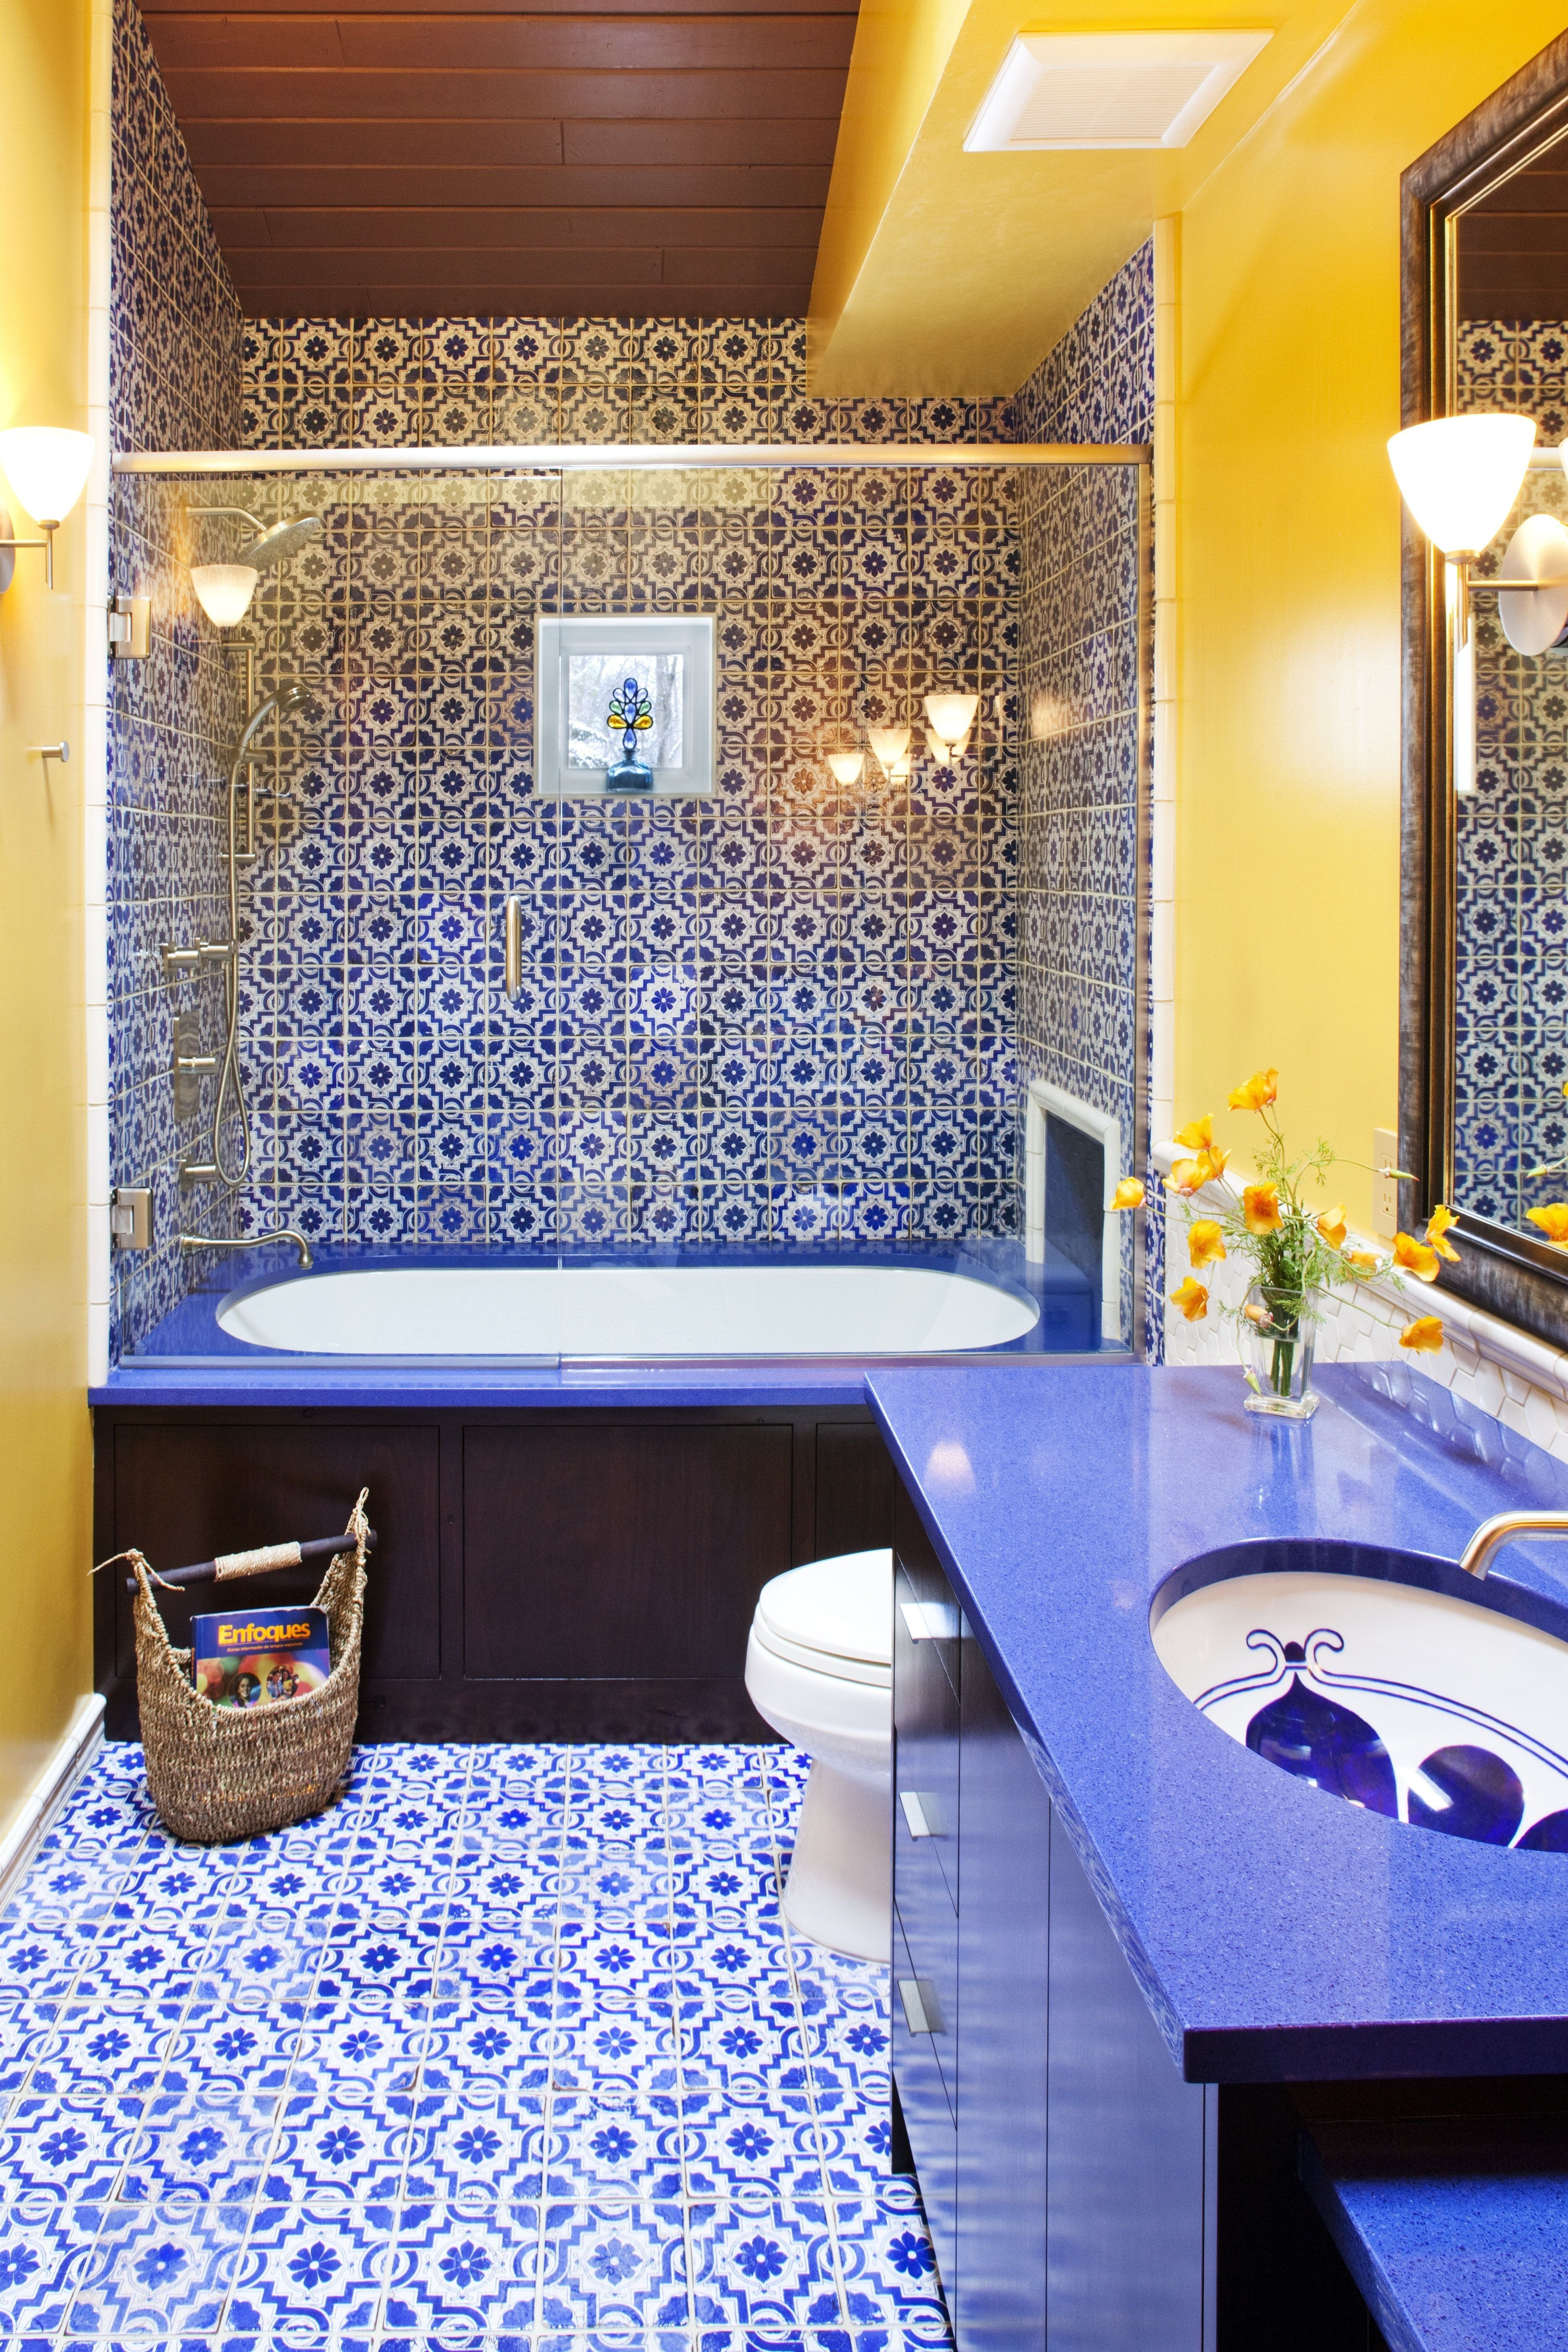 24 Fresh Blue And Yellow Bathroom Decor In 2020 Yellow Bathroom Decor Blue Bathroom Decor Yellow Bathrooms